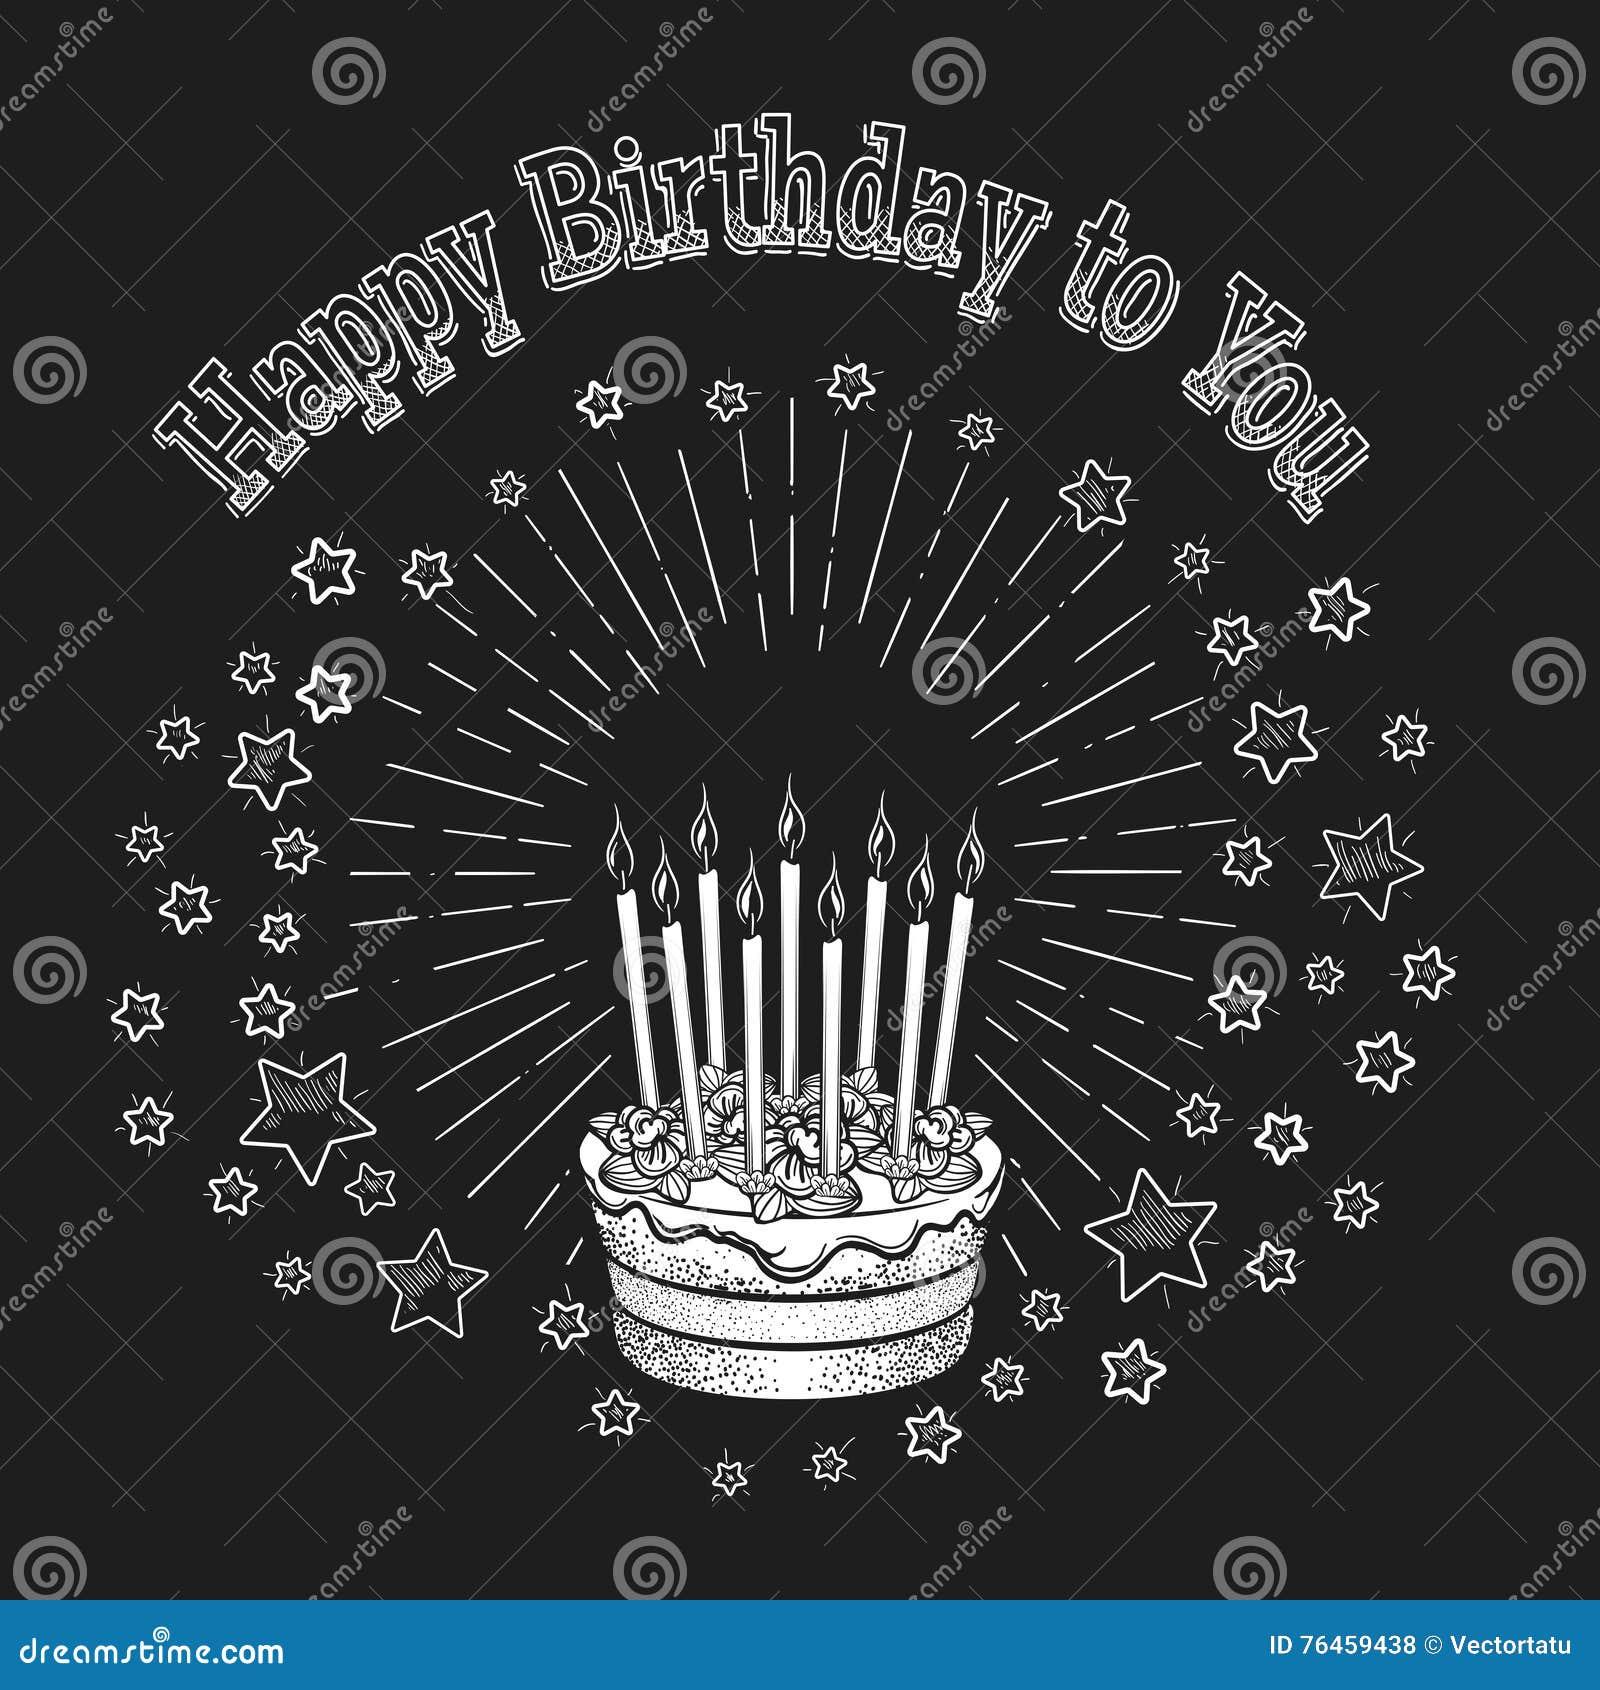 Birthday Cake Chalkboard Greeting Card Stock Vector Illustration